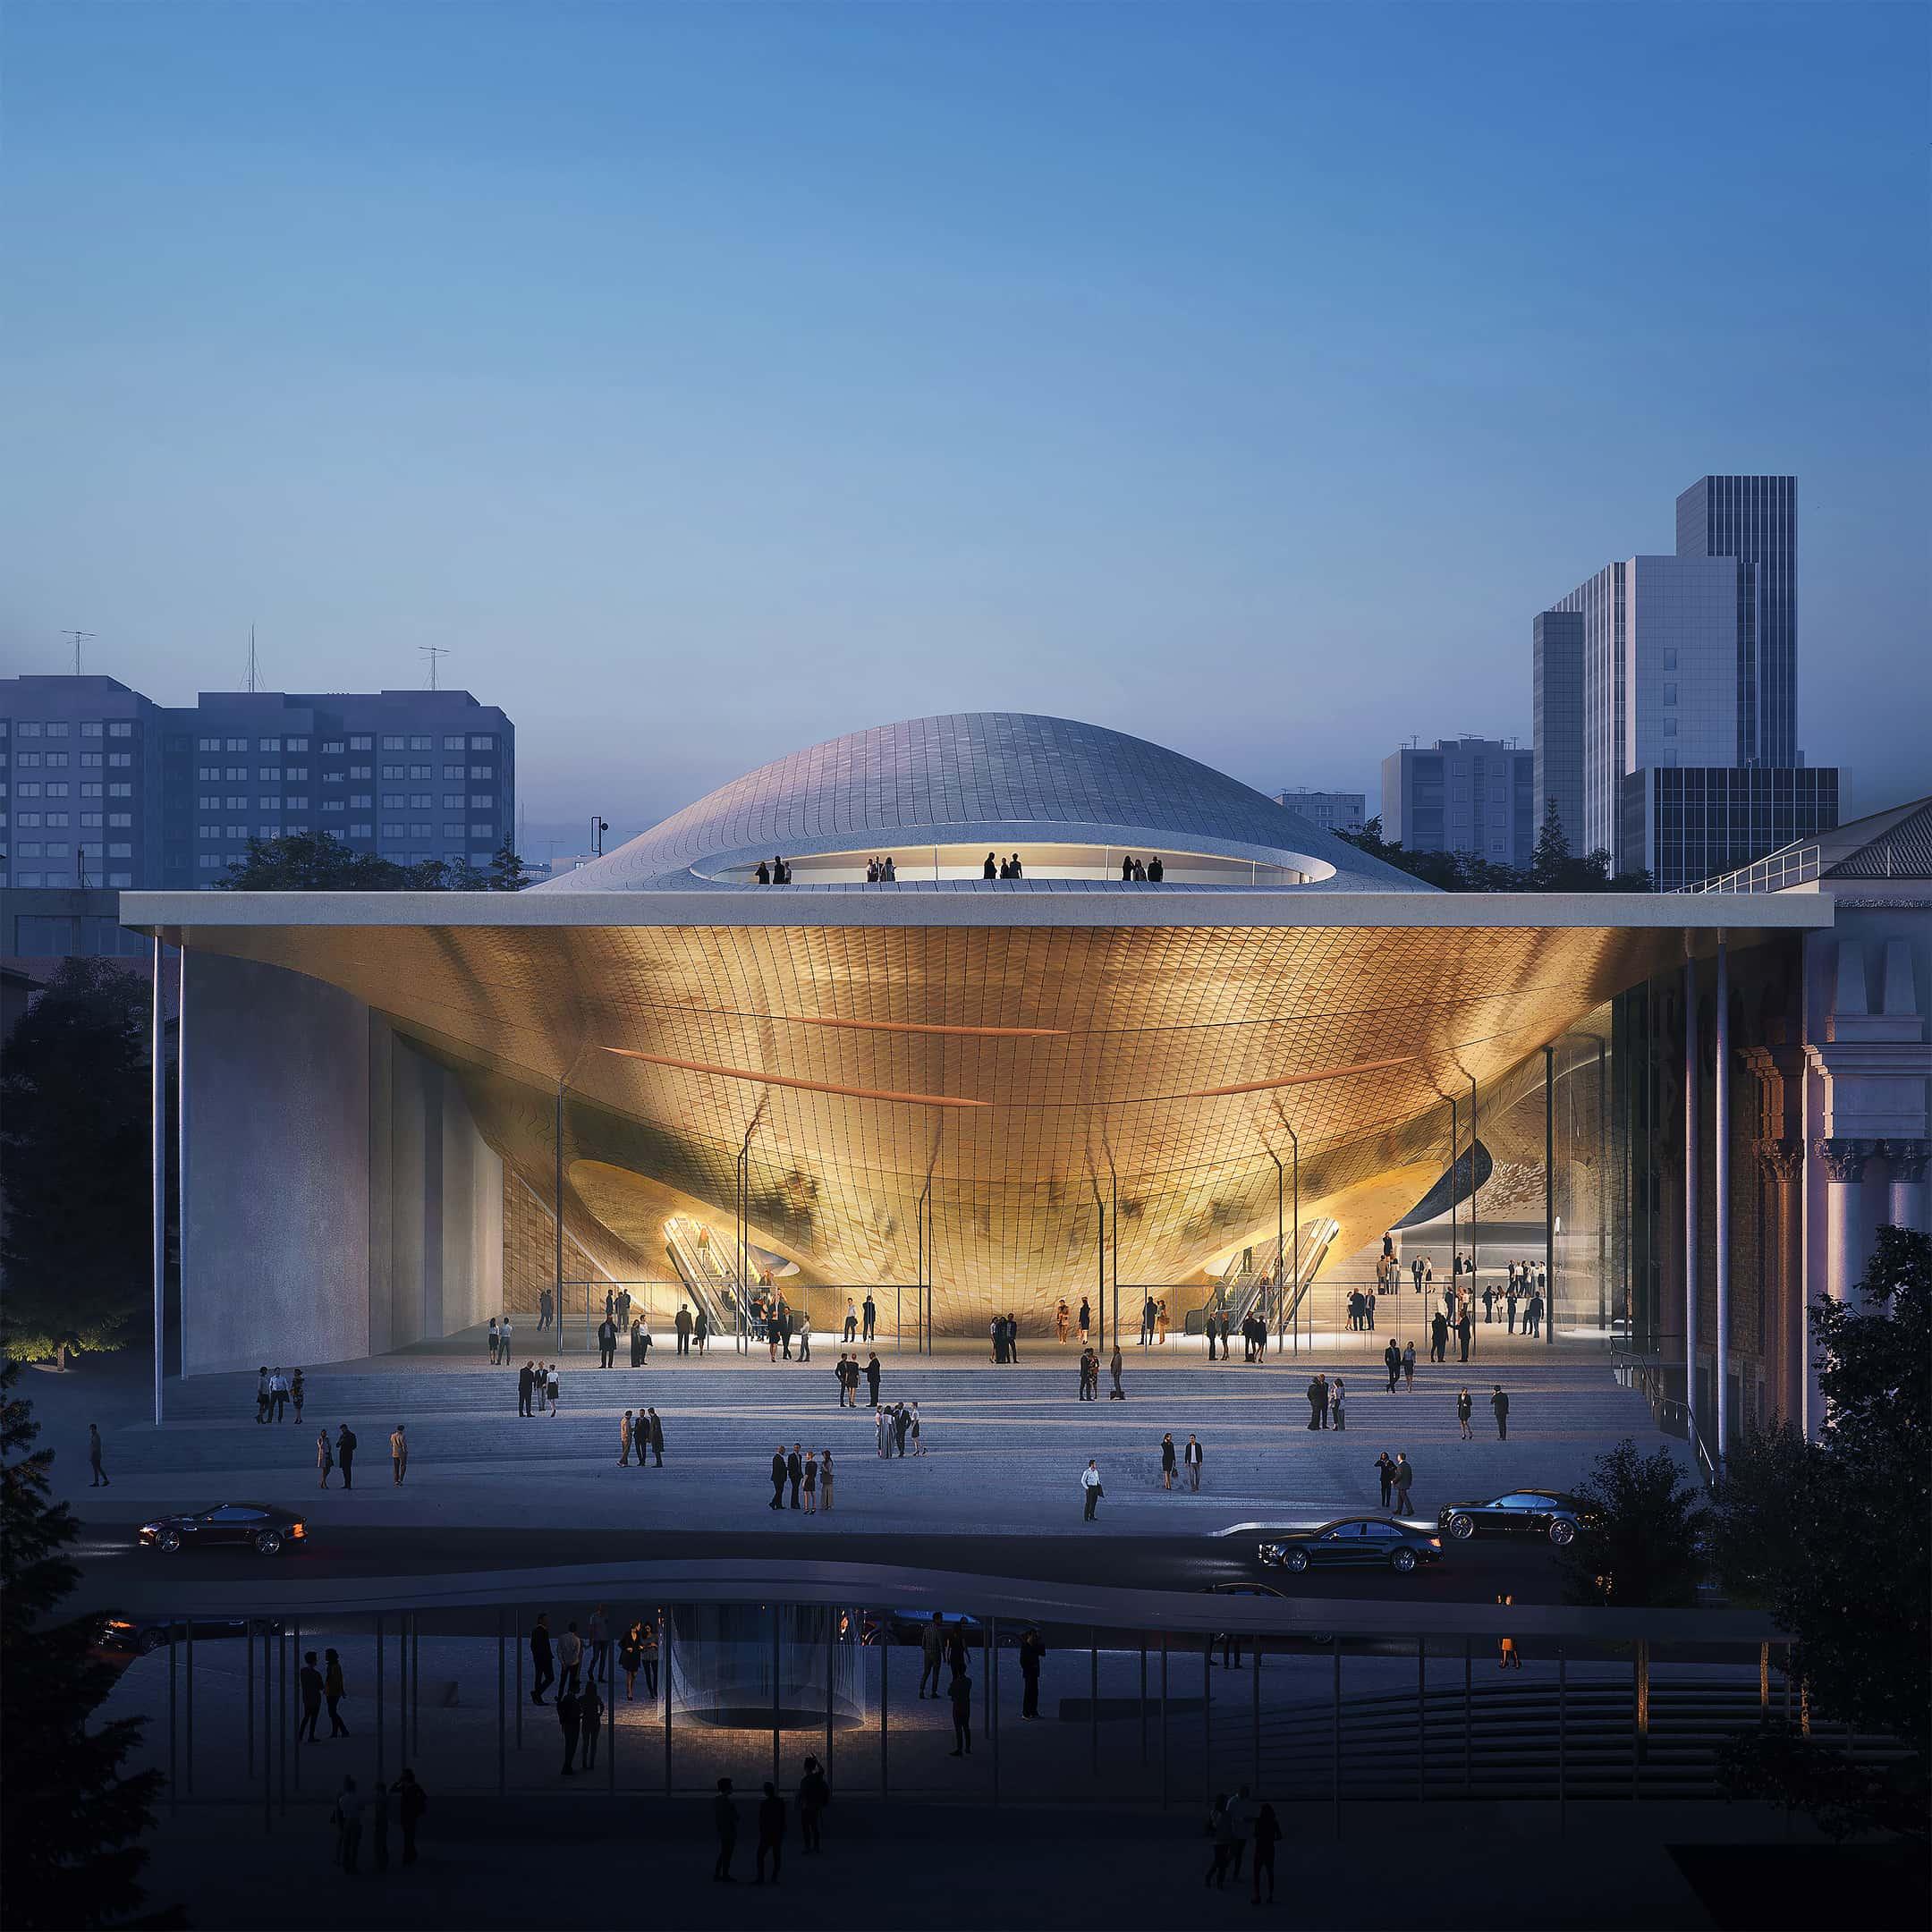 Philharmonic Concert Hall